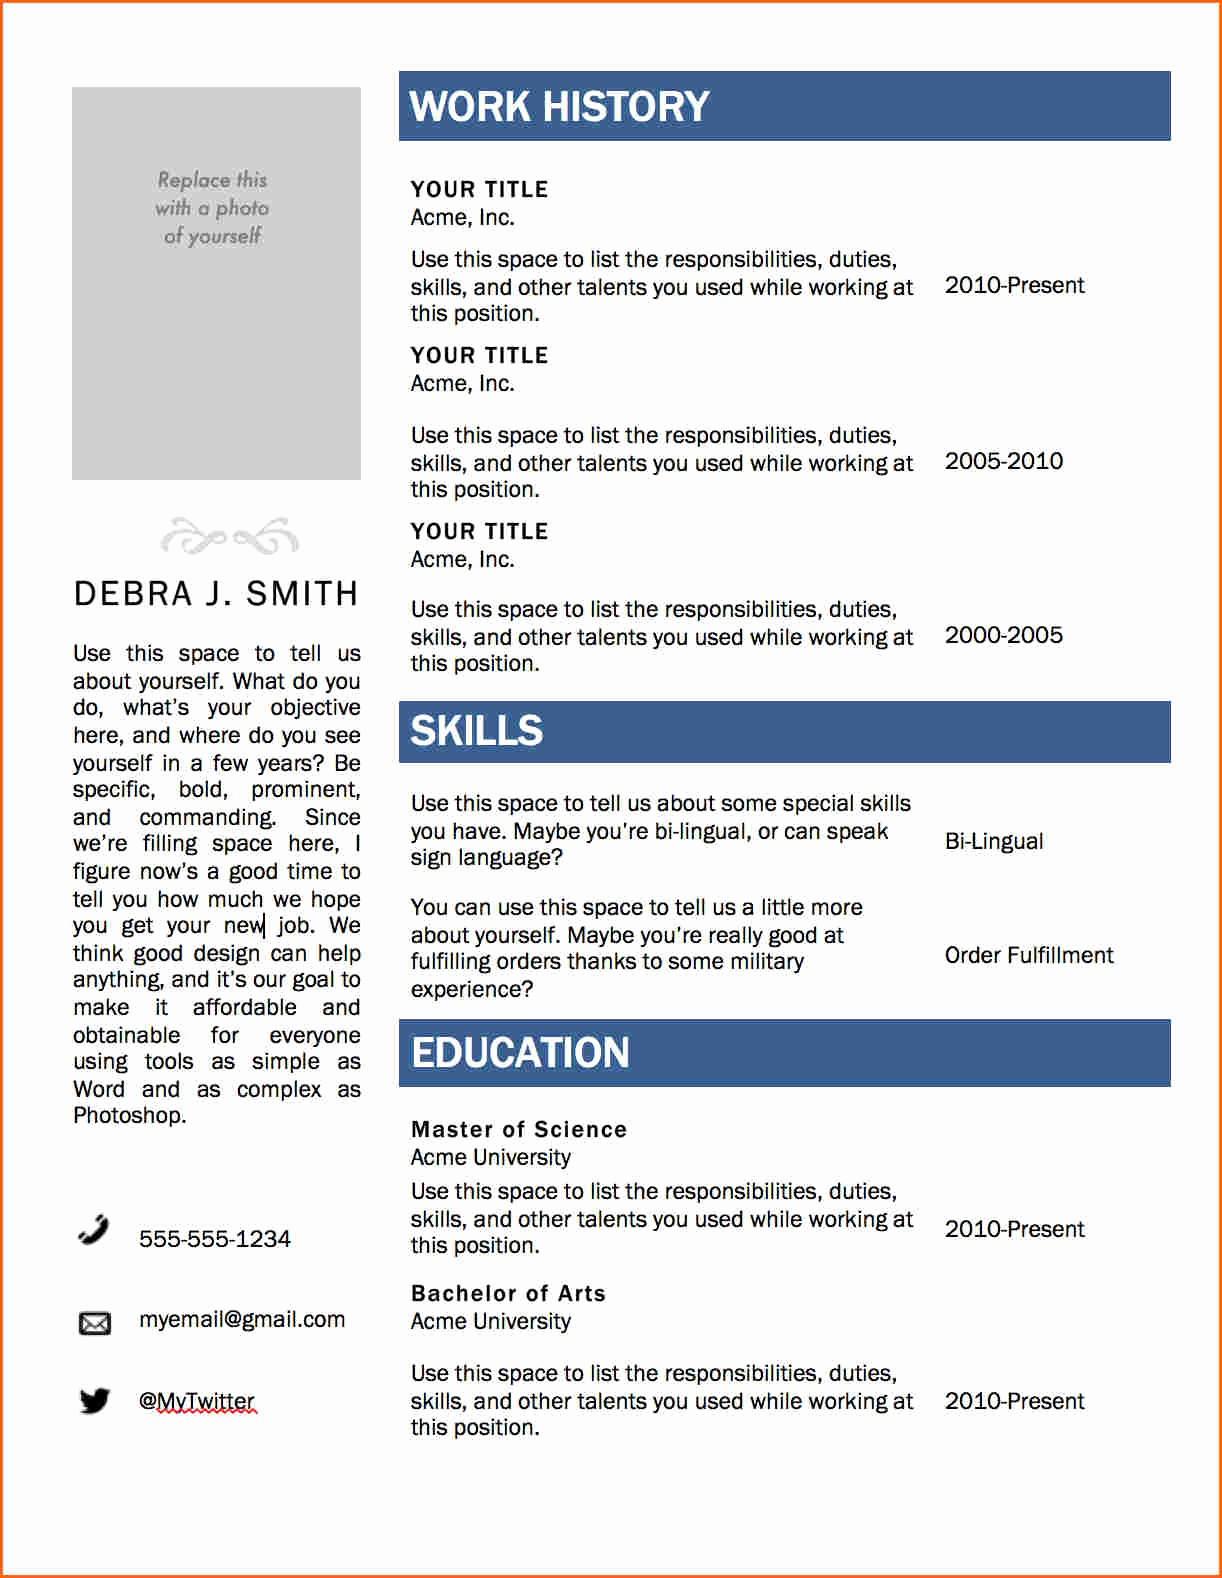 Resumes On Microsoft Word 2007 Inspirational 6 Free Resume Templates Microsoft Word 2007 Bud